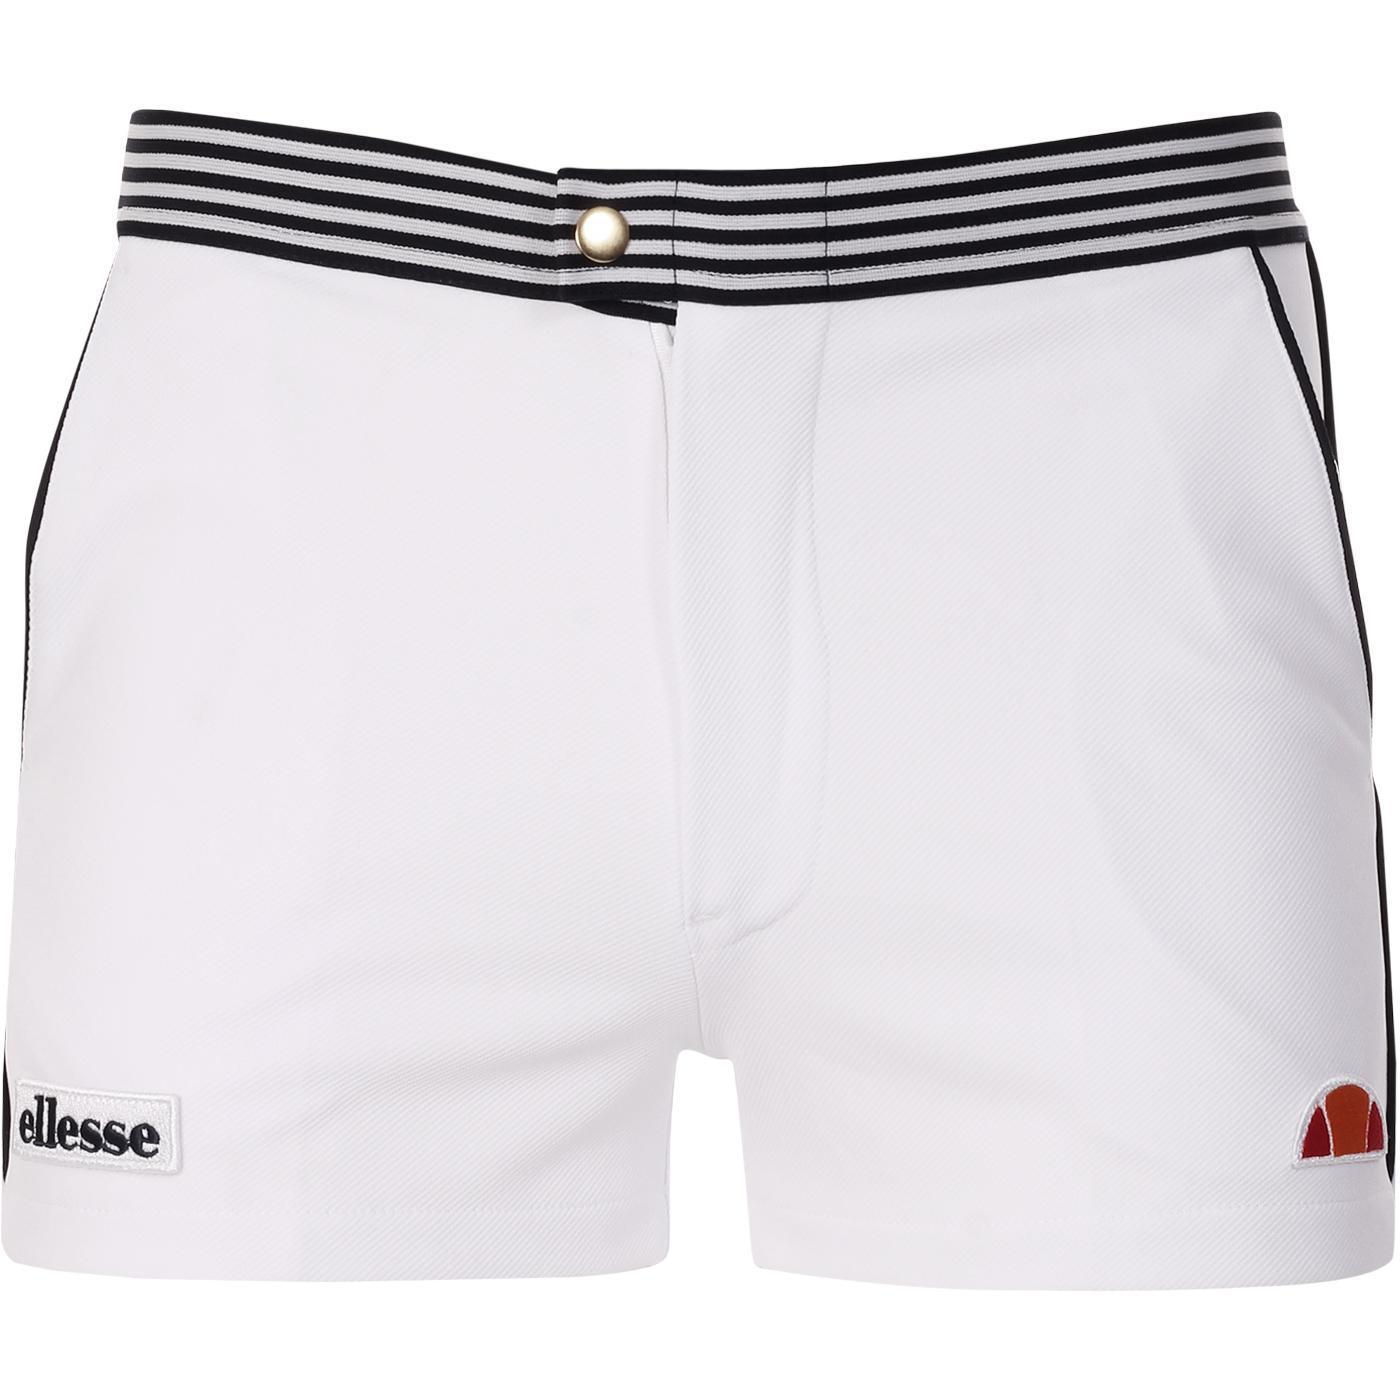 Renzo ELLESSE Retro 1980s Twill Tennis Shorts (W)